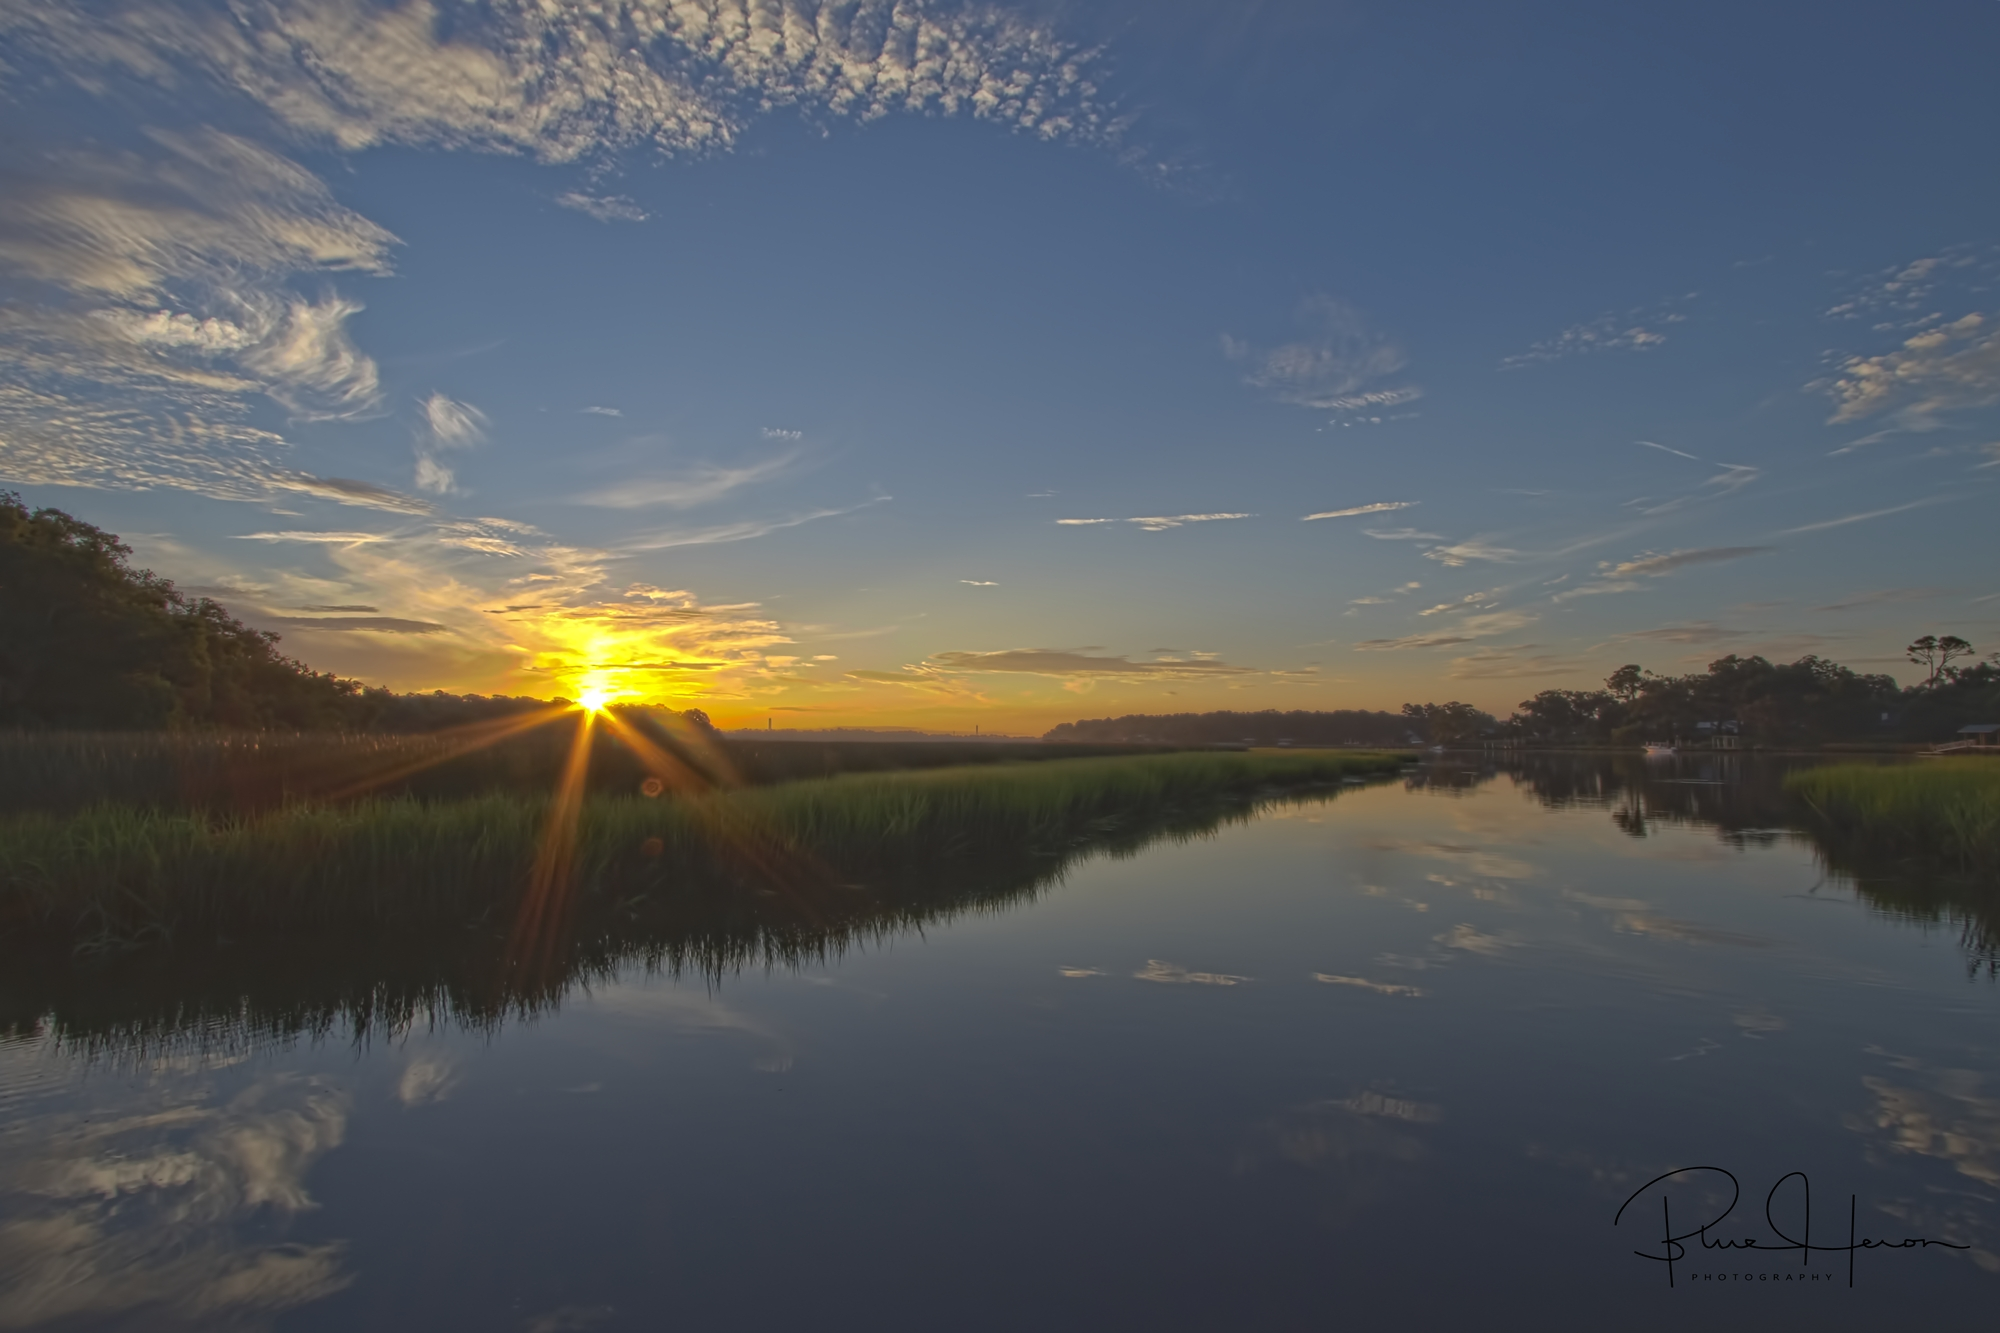 Dawn breaks on the Broward